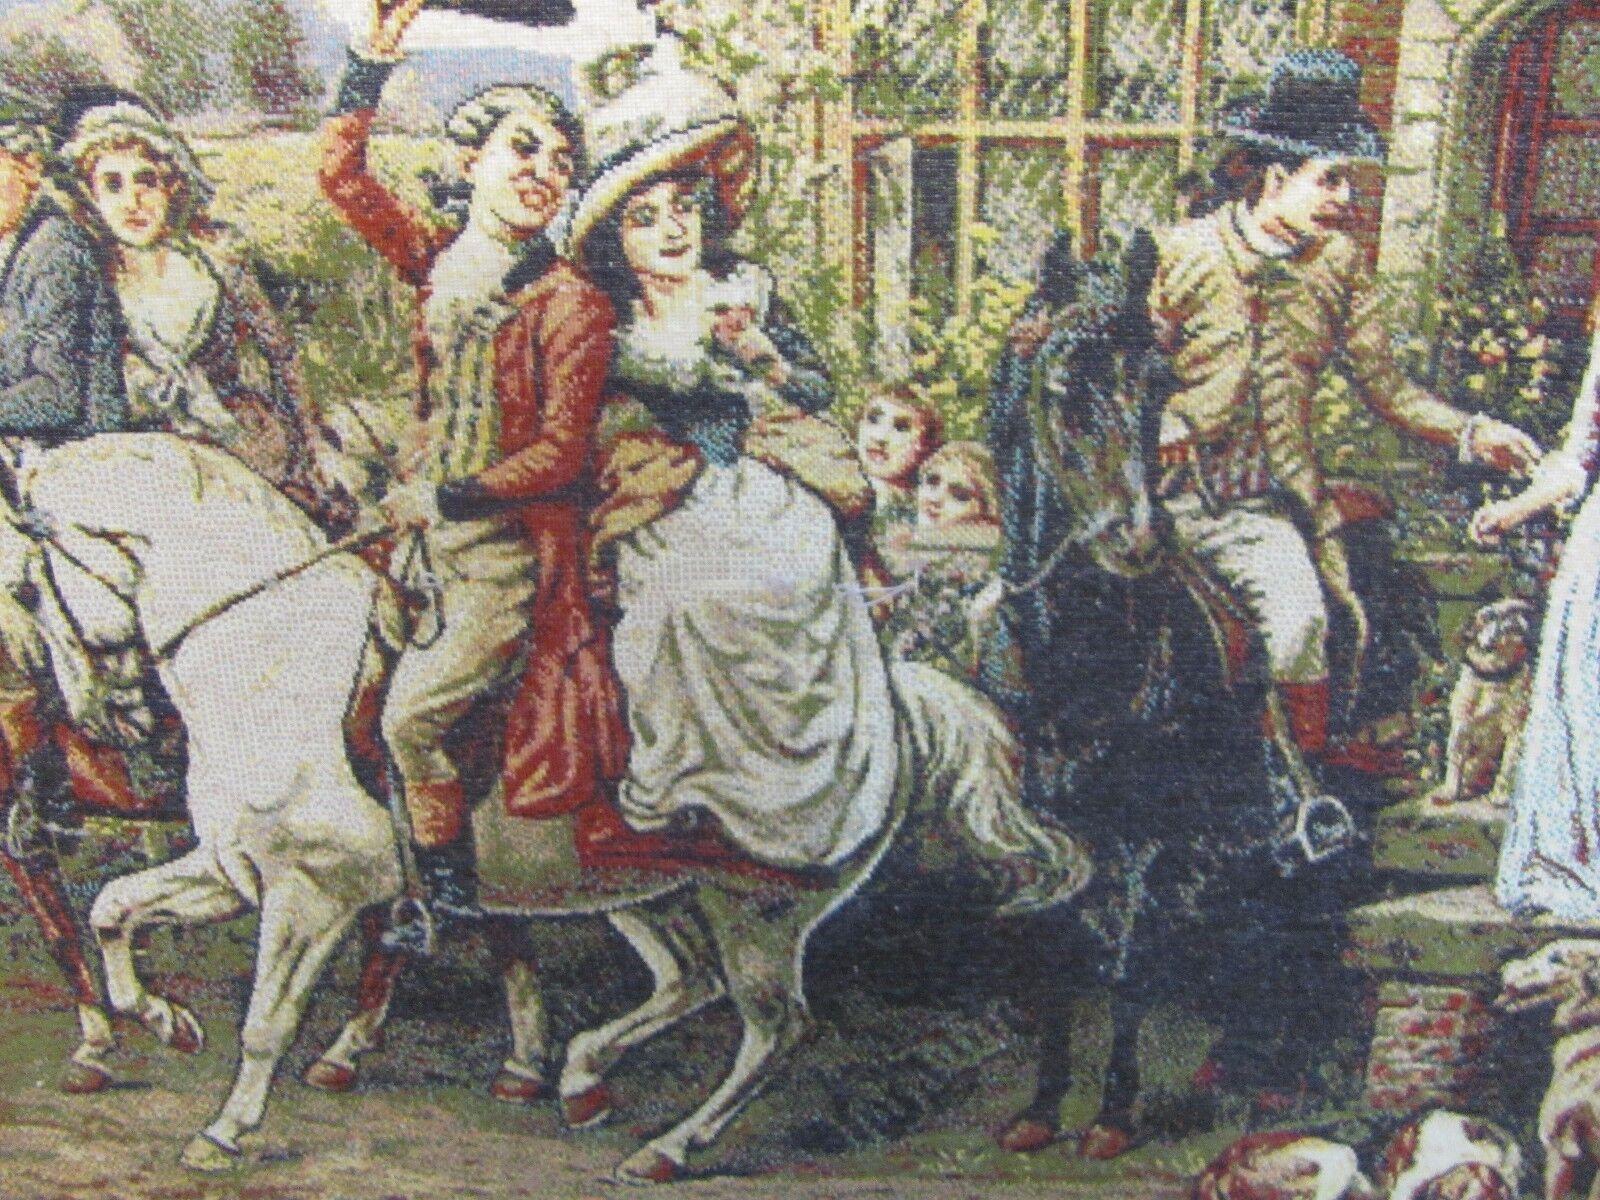 Une charFemmete Main Tufté Persan Pictorial Tapis Tapis Tapis (90 x 70 cm) 4c2a1b